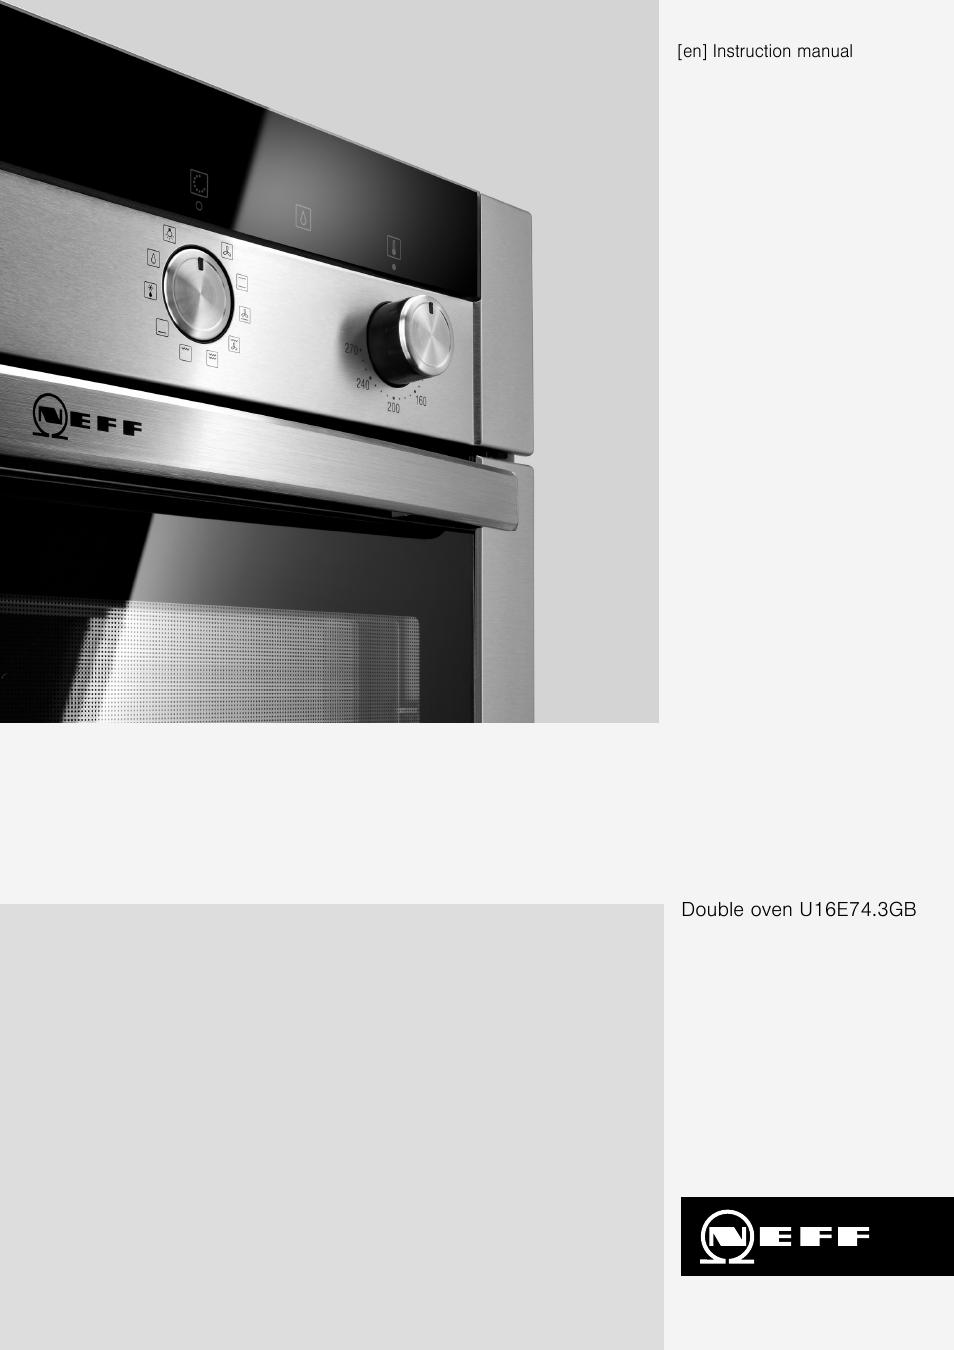 neff u16e74n3gb user manual 36 pages rh manualsdir com neff cooker hood instruction manual neff oven instruction manual